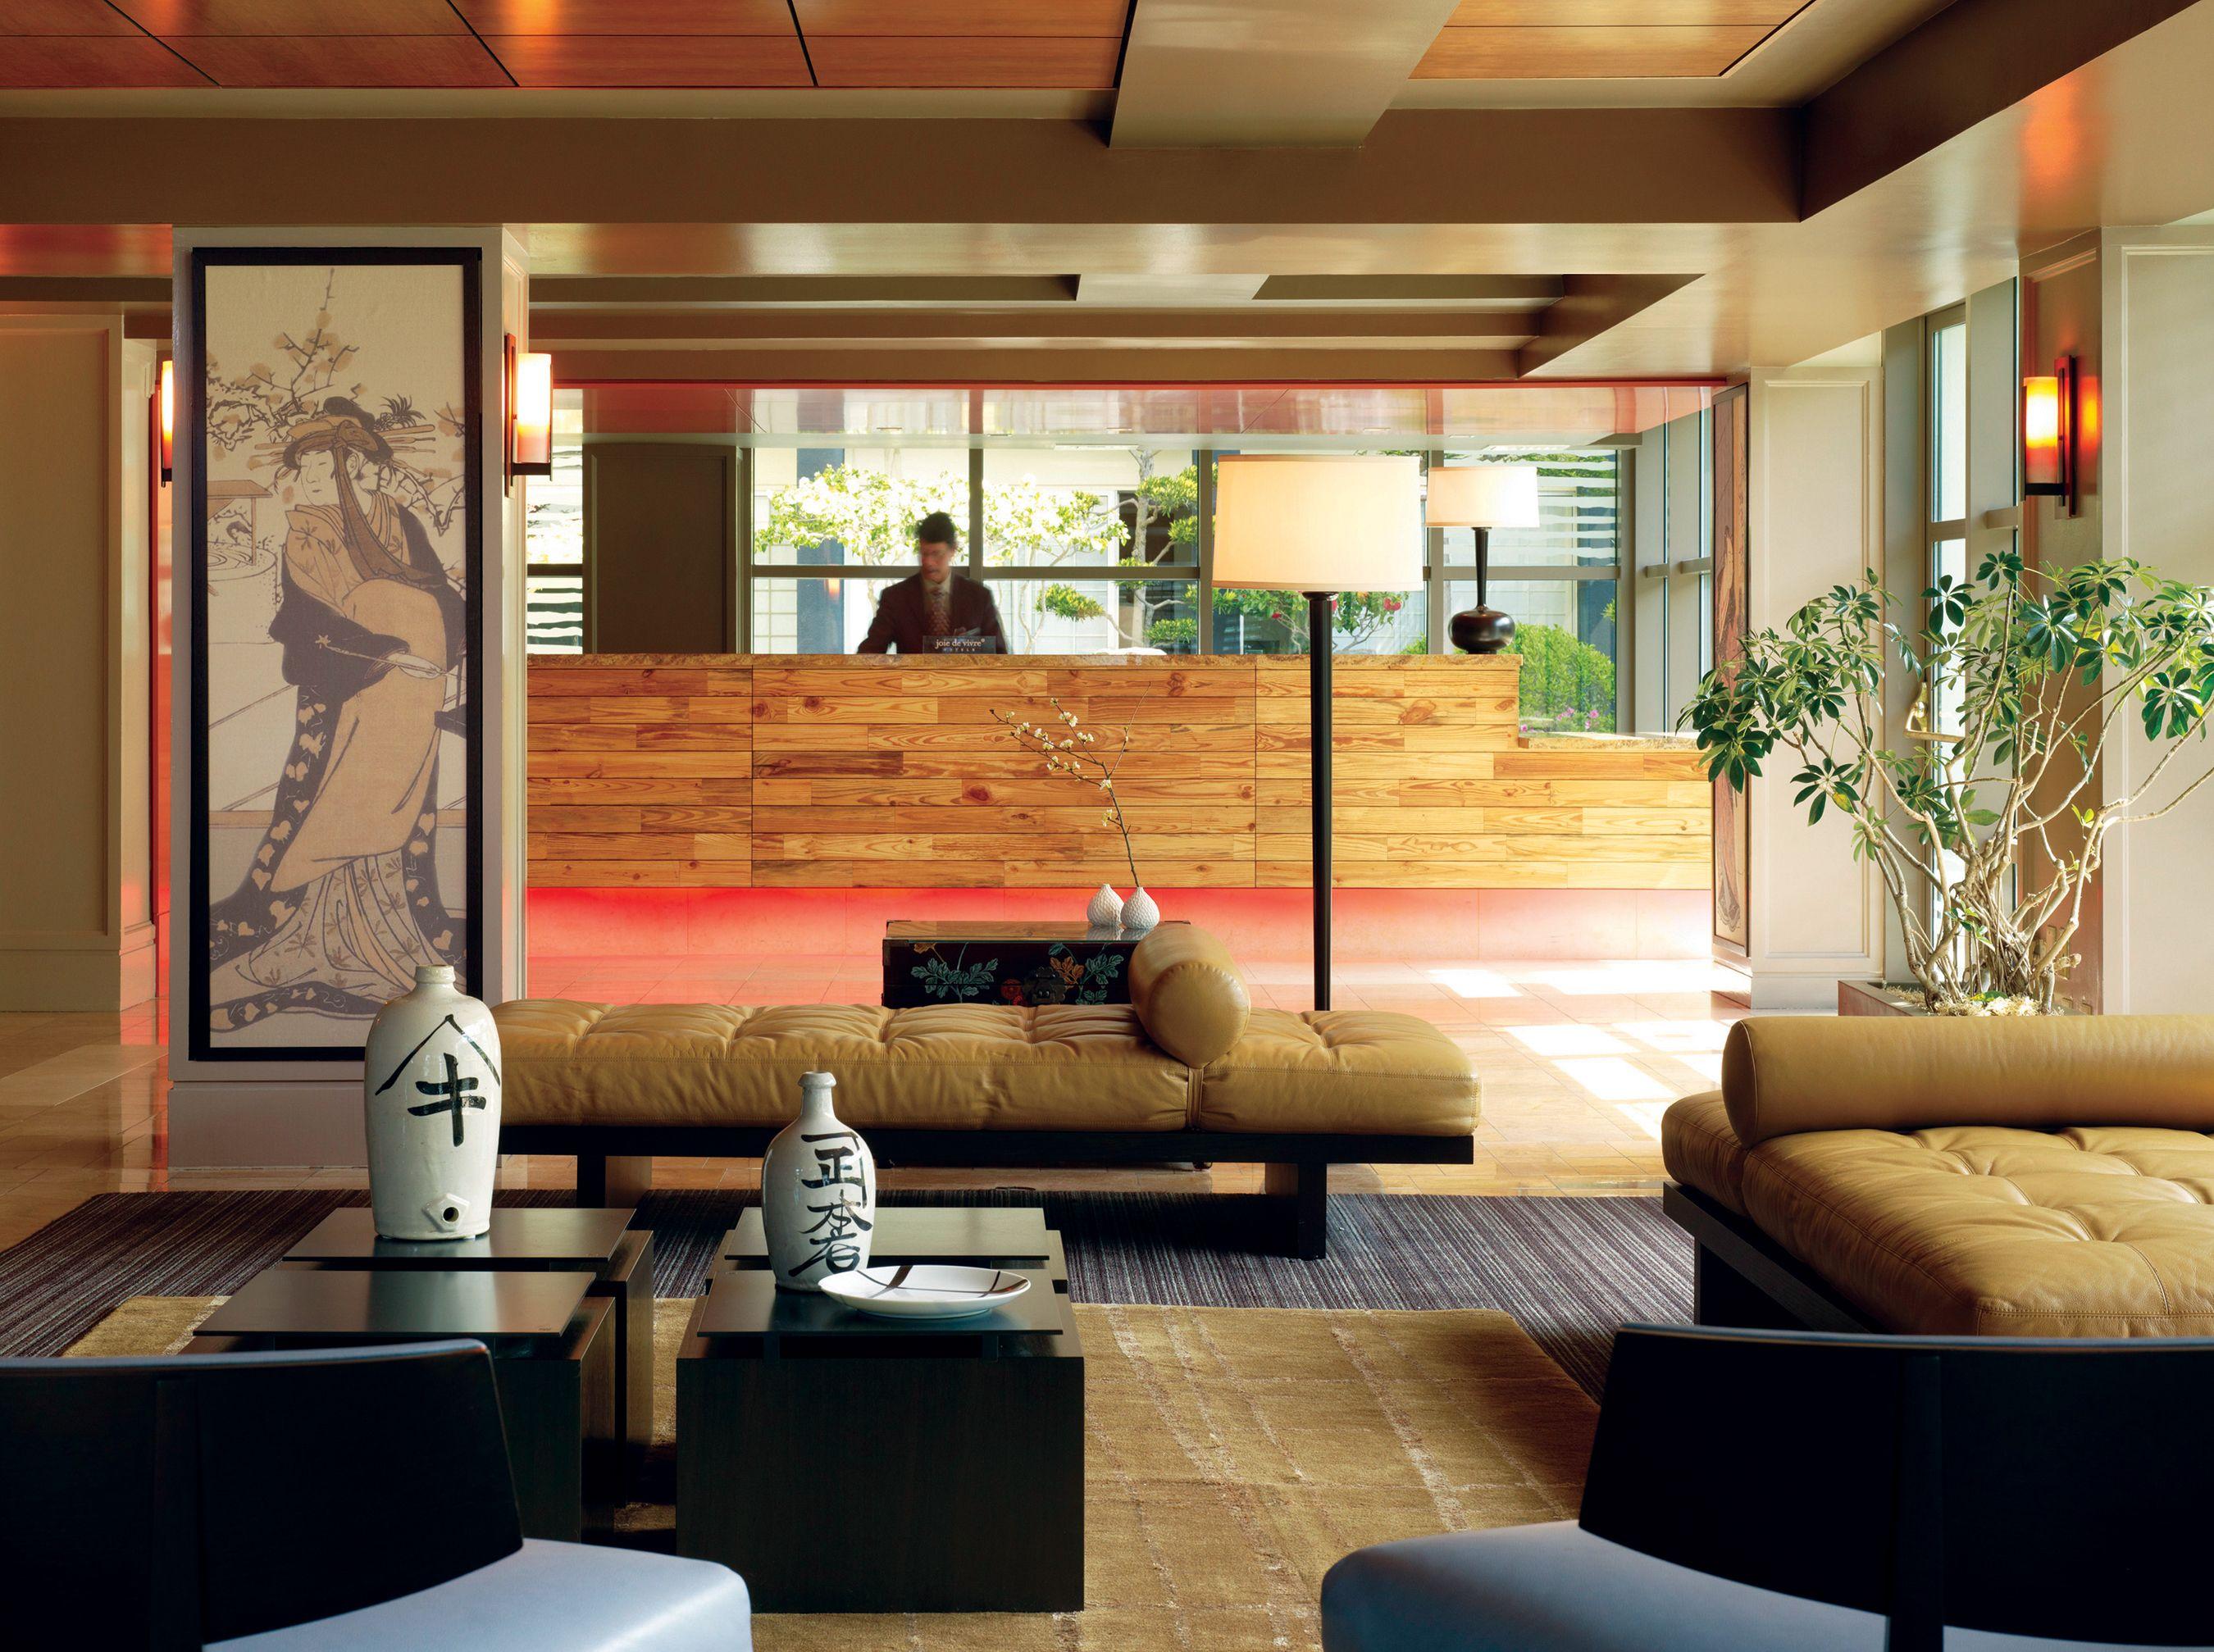 Hotel Kabuki With Images California Design Asian Home Decor